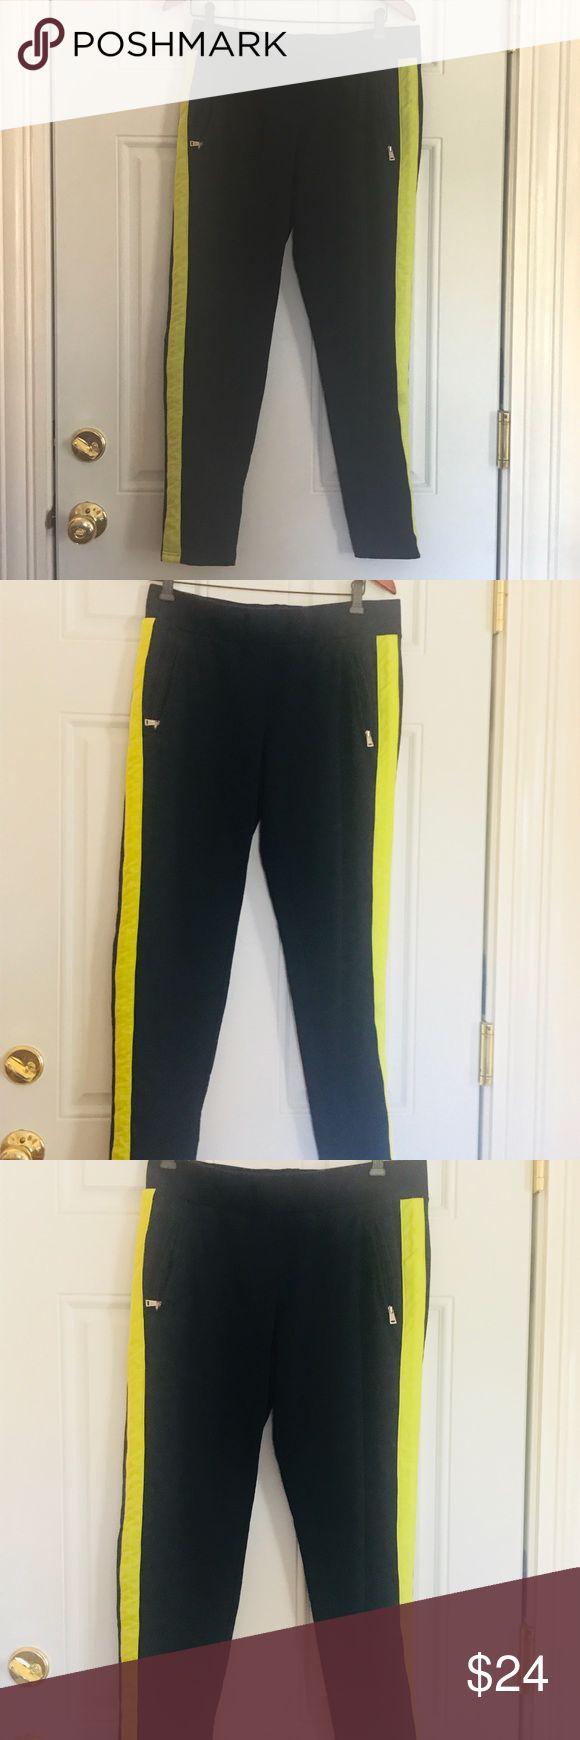 Ralph Lauren neon joggers Super soft and cozy!! Ralph Lauren Pants Track Pants & Joggers